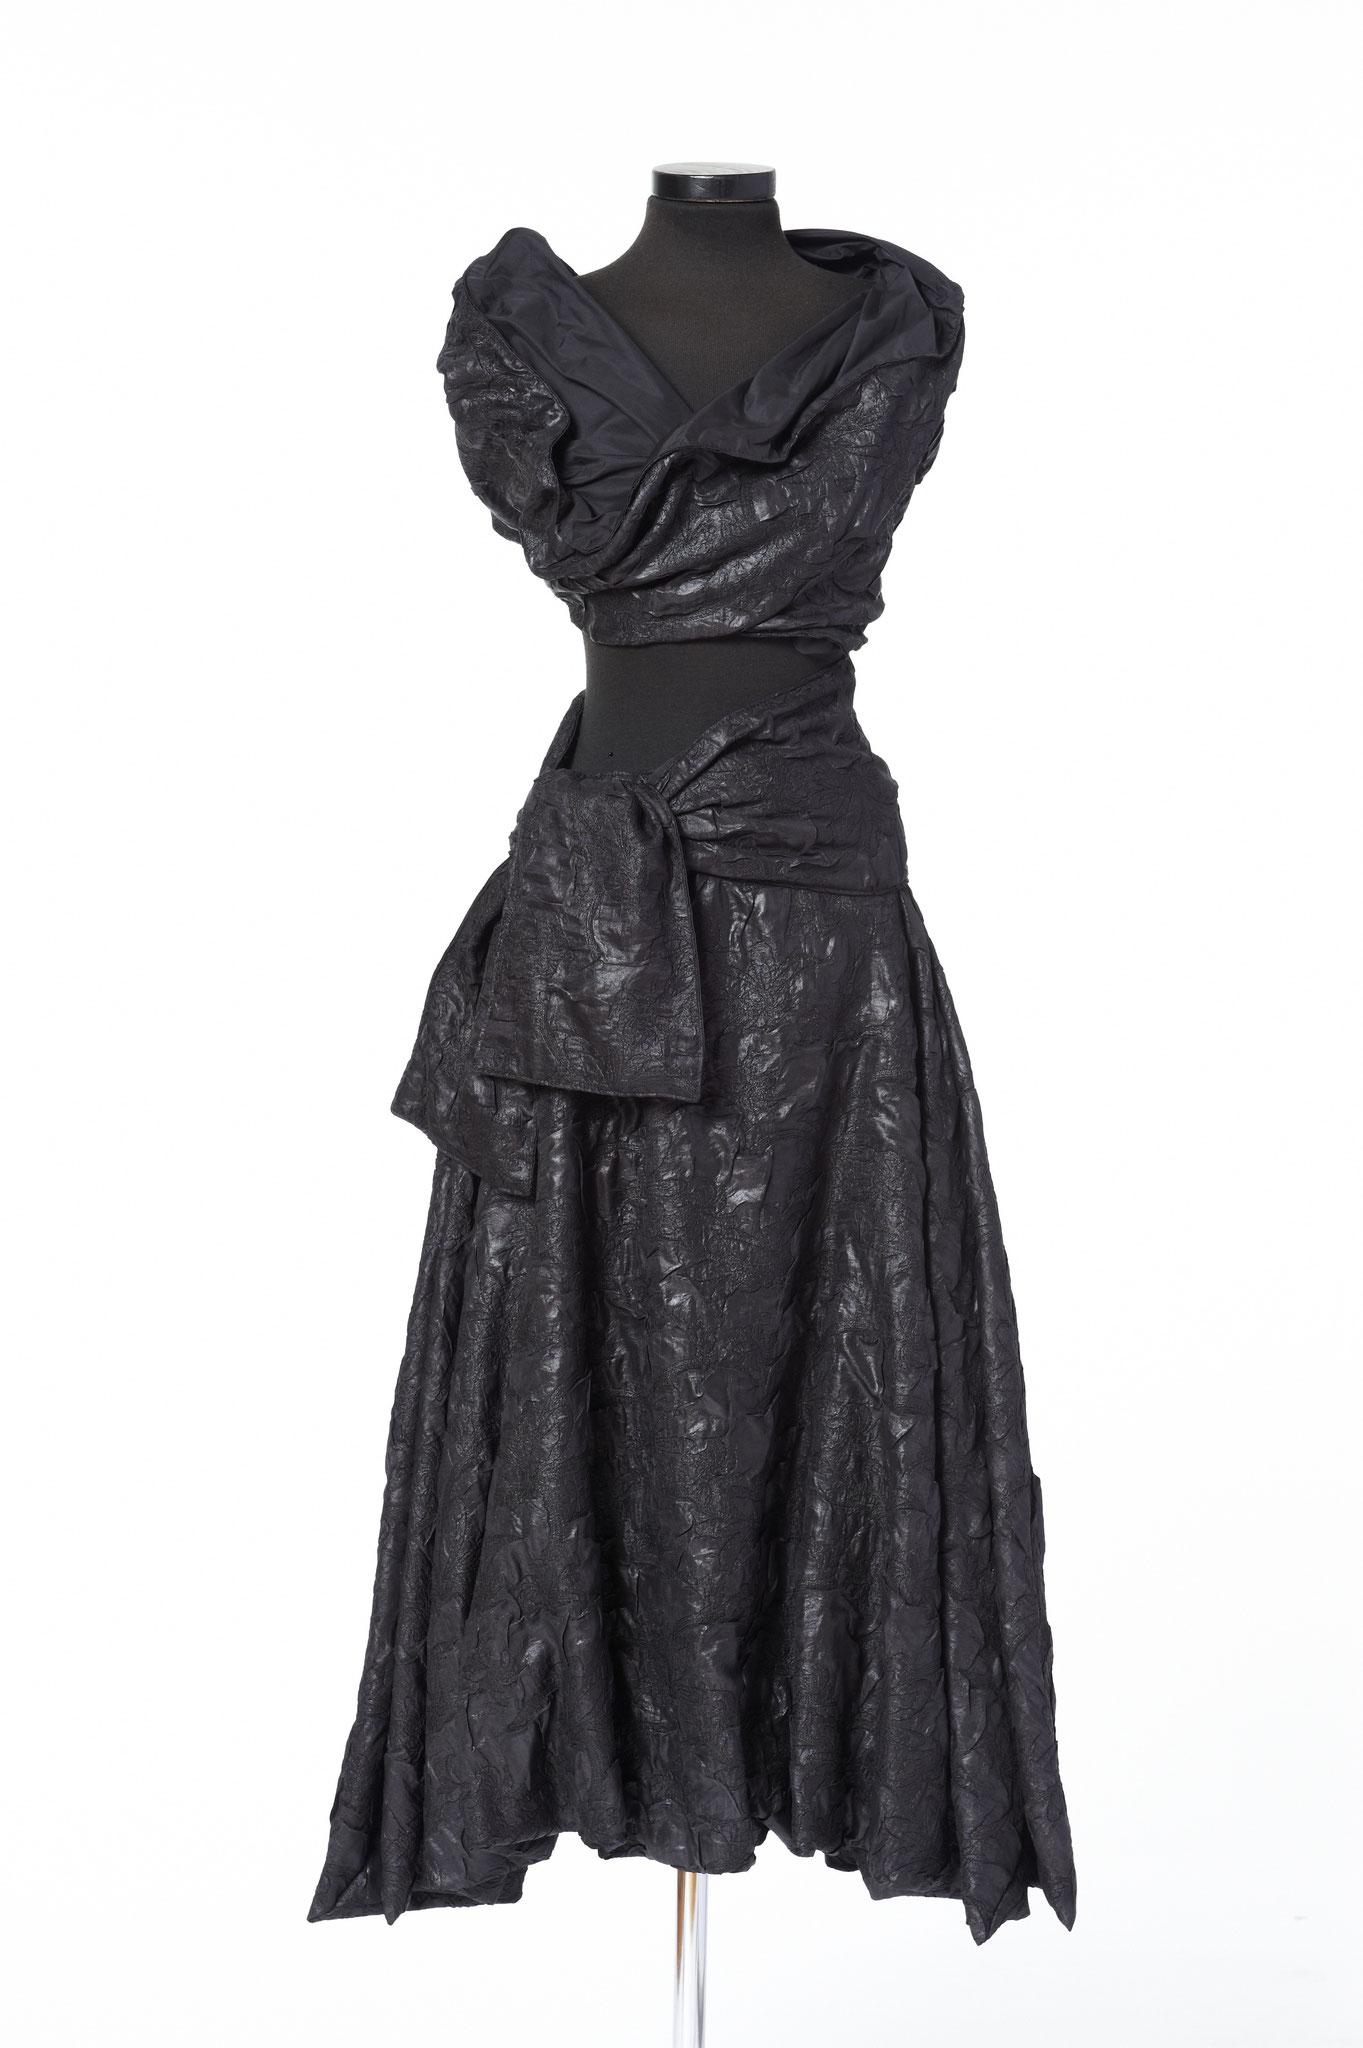 3-teiliges Outfit: Rock, Schärpe, Oberteil. Material: Baumwolle/ Viskose/ Mikrofaser